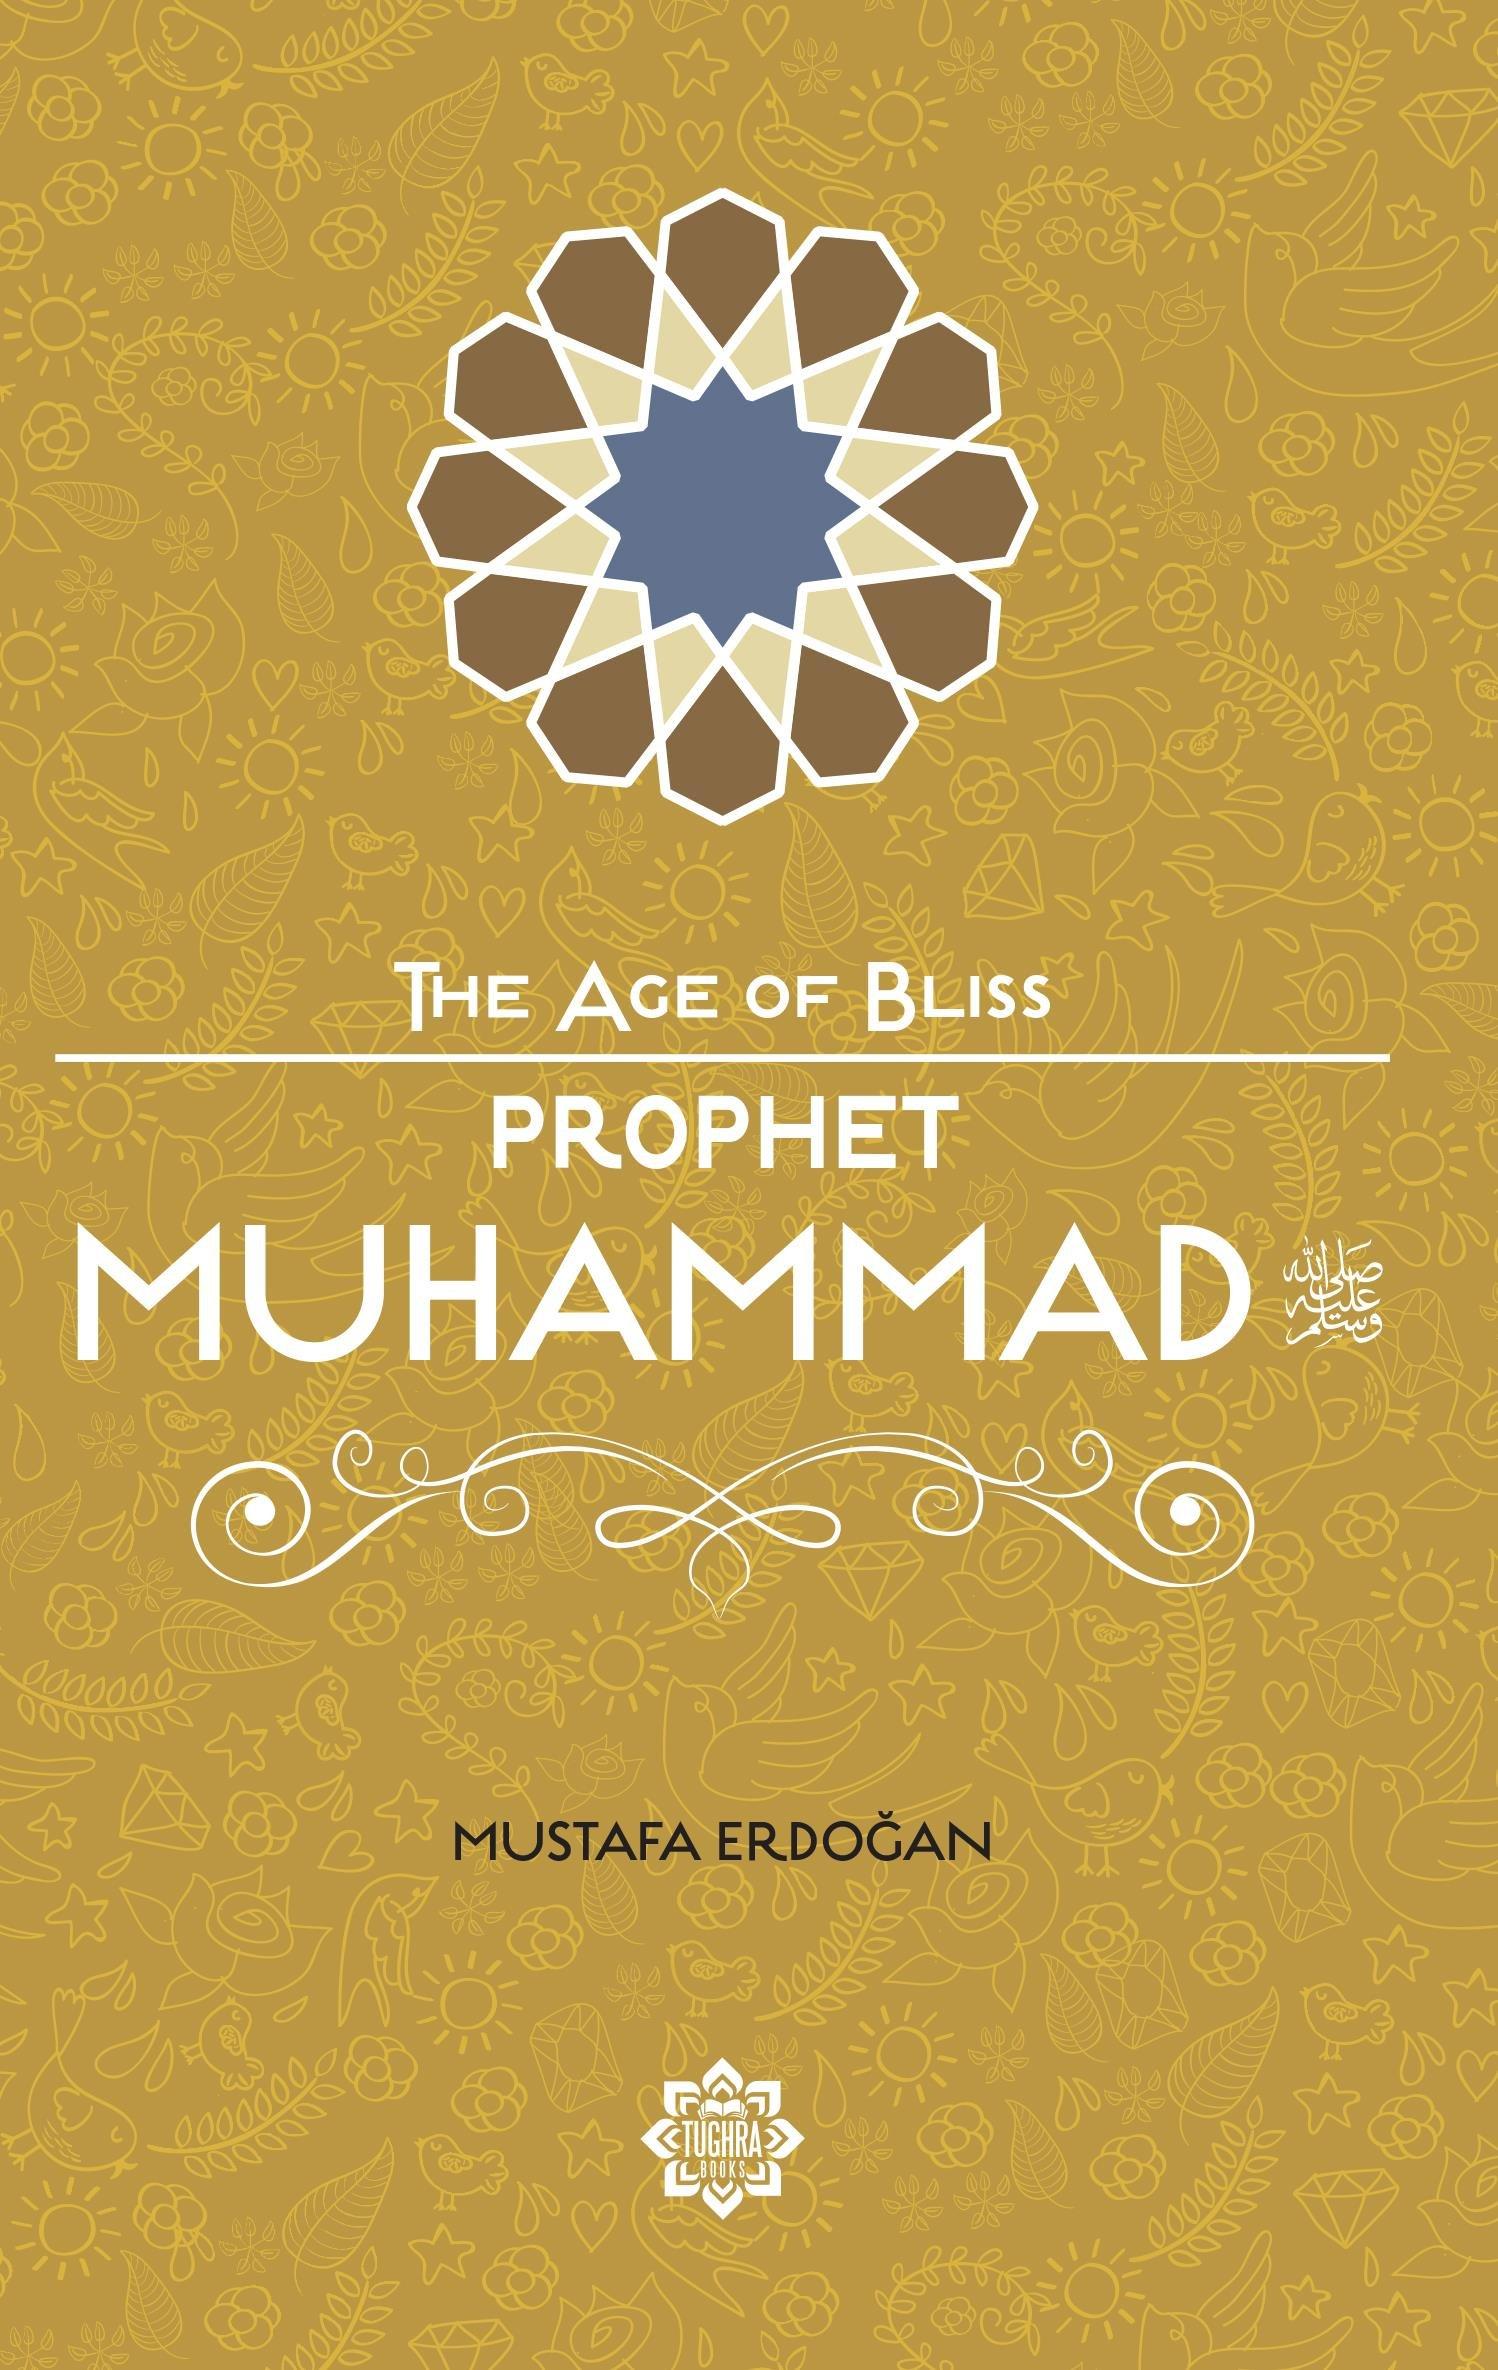 Prophet muhammad the age of bliss mustafa erdogan prophet muhammad the age of bliss mustafa erdogan 9781597843829 amazon books fandeluxe Image collections